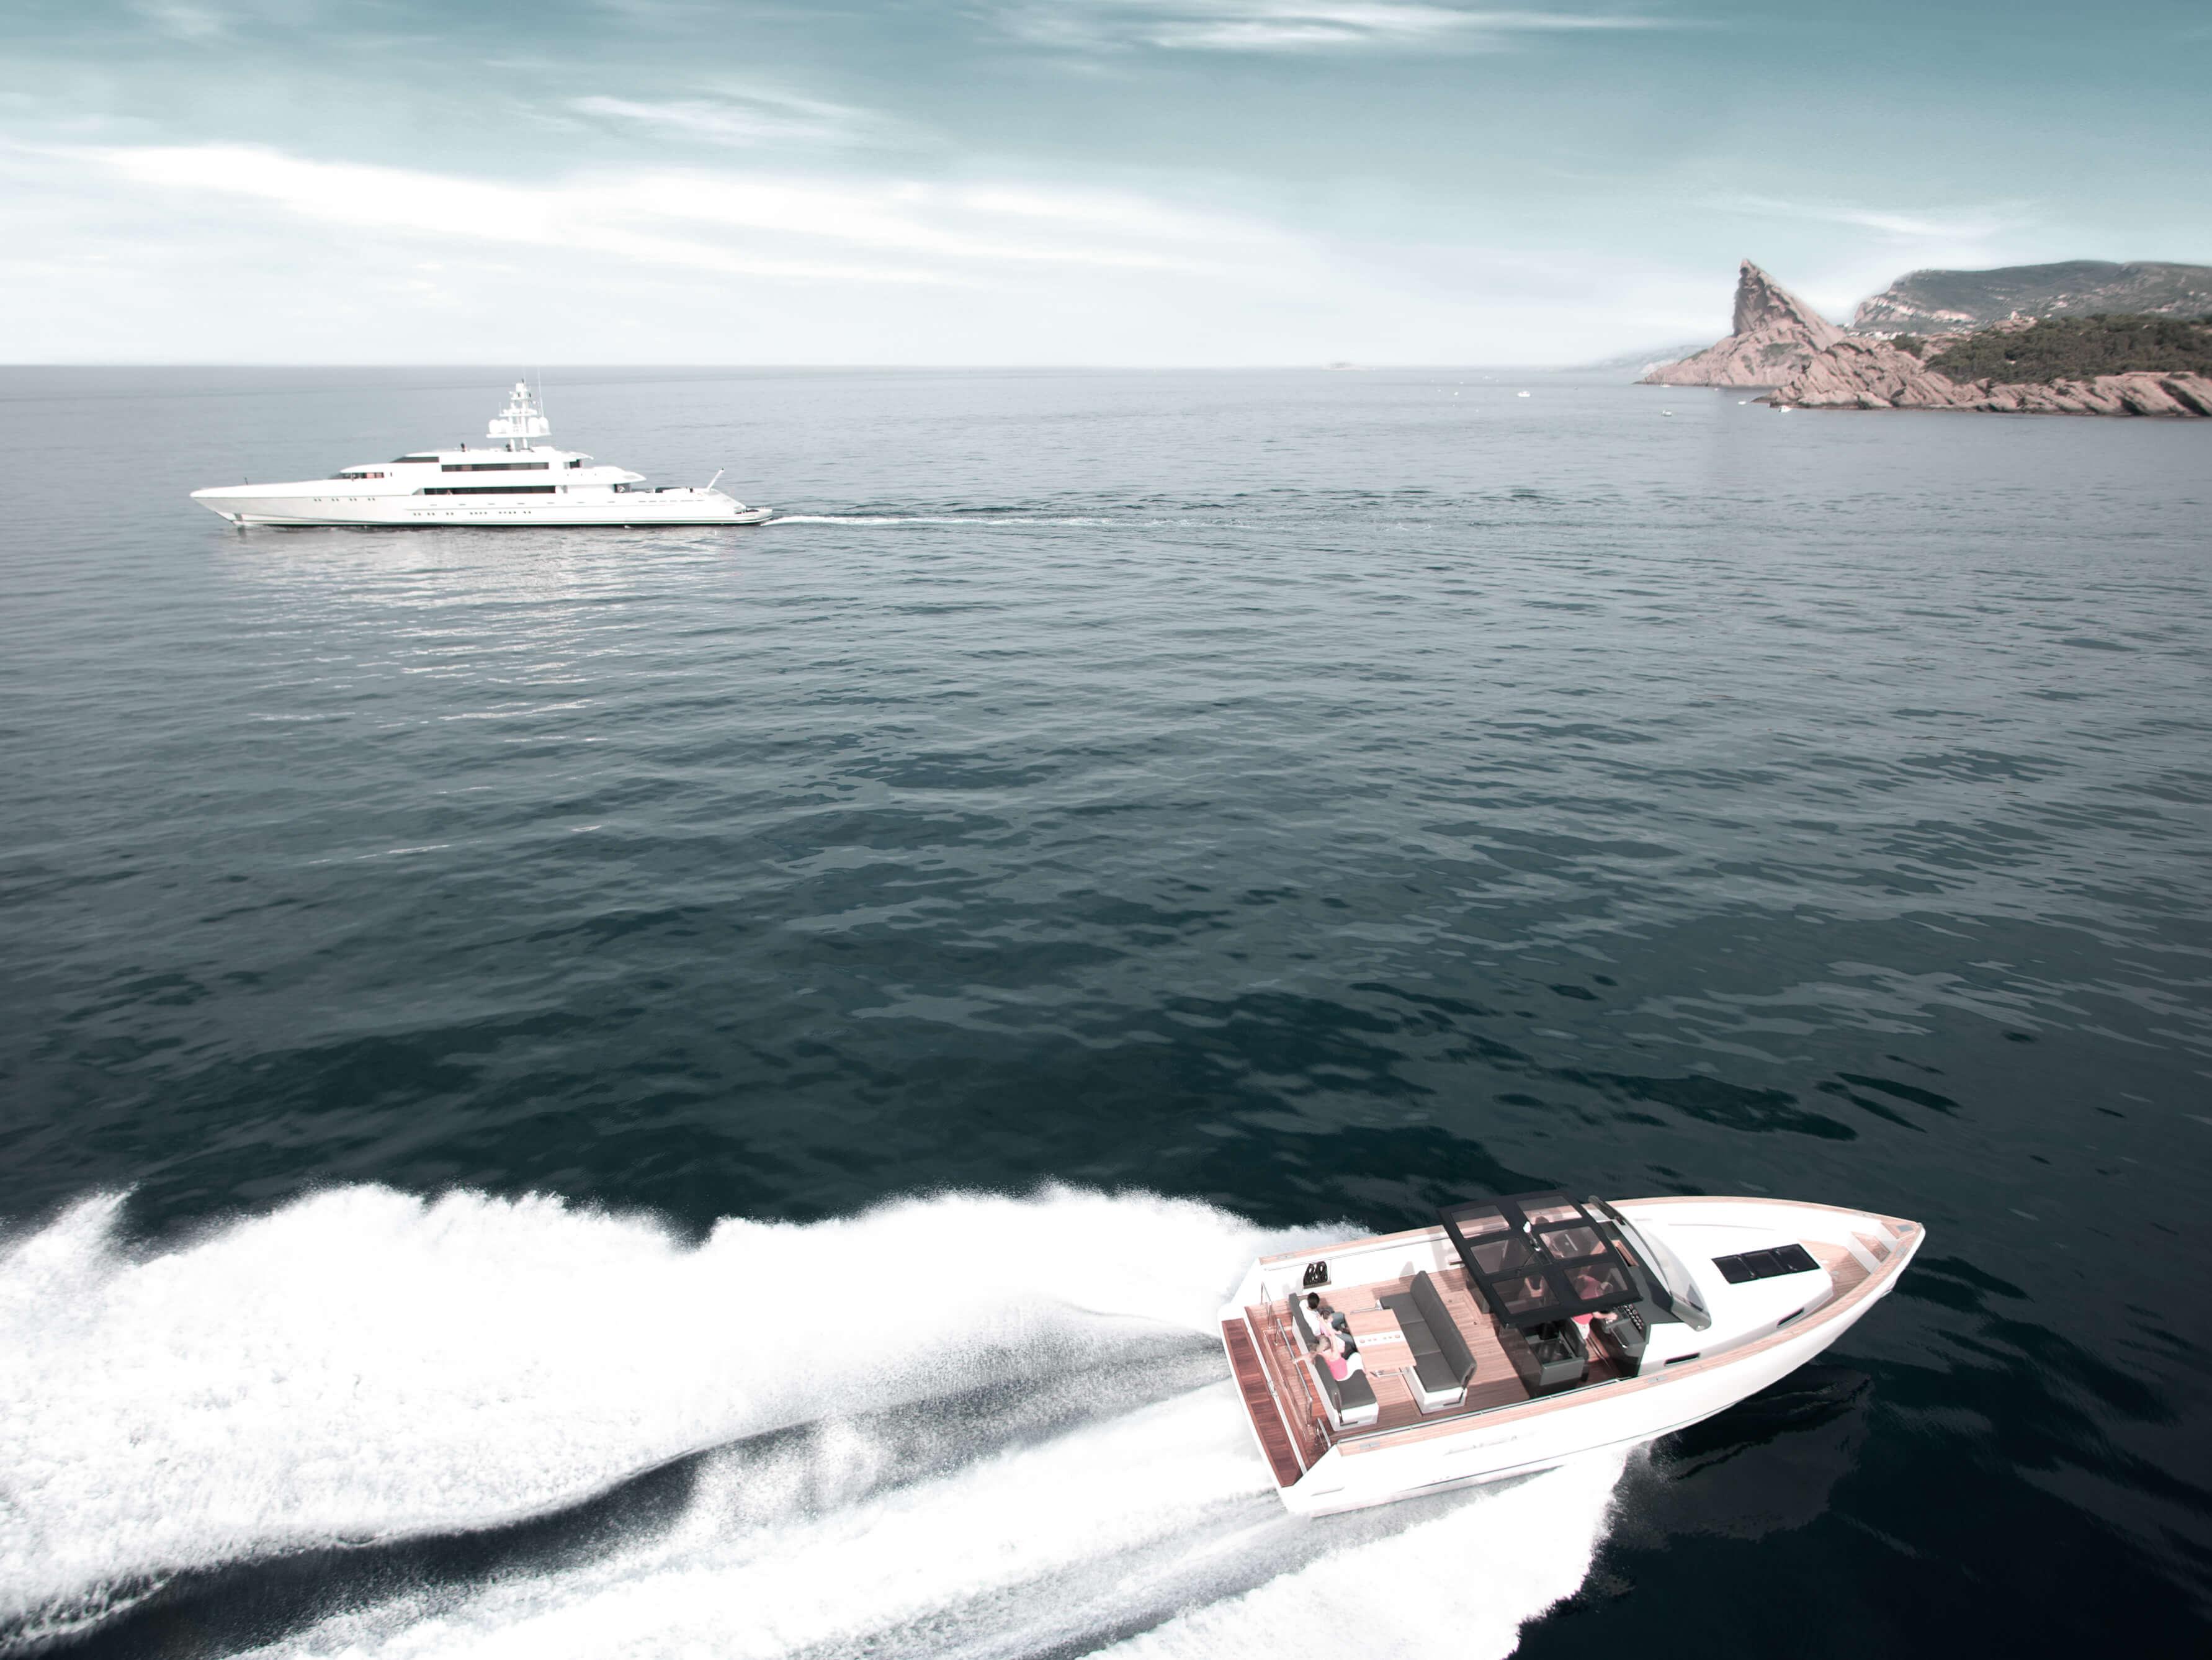 Fjord 40 open Außenansicht Fahrt | Cockpit, Lounge-Area, Teakdeck | Fjord